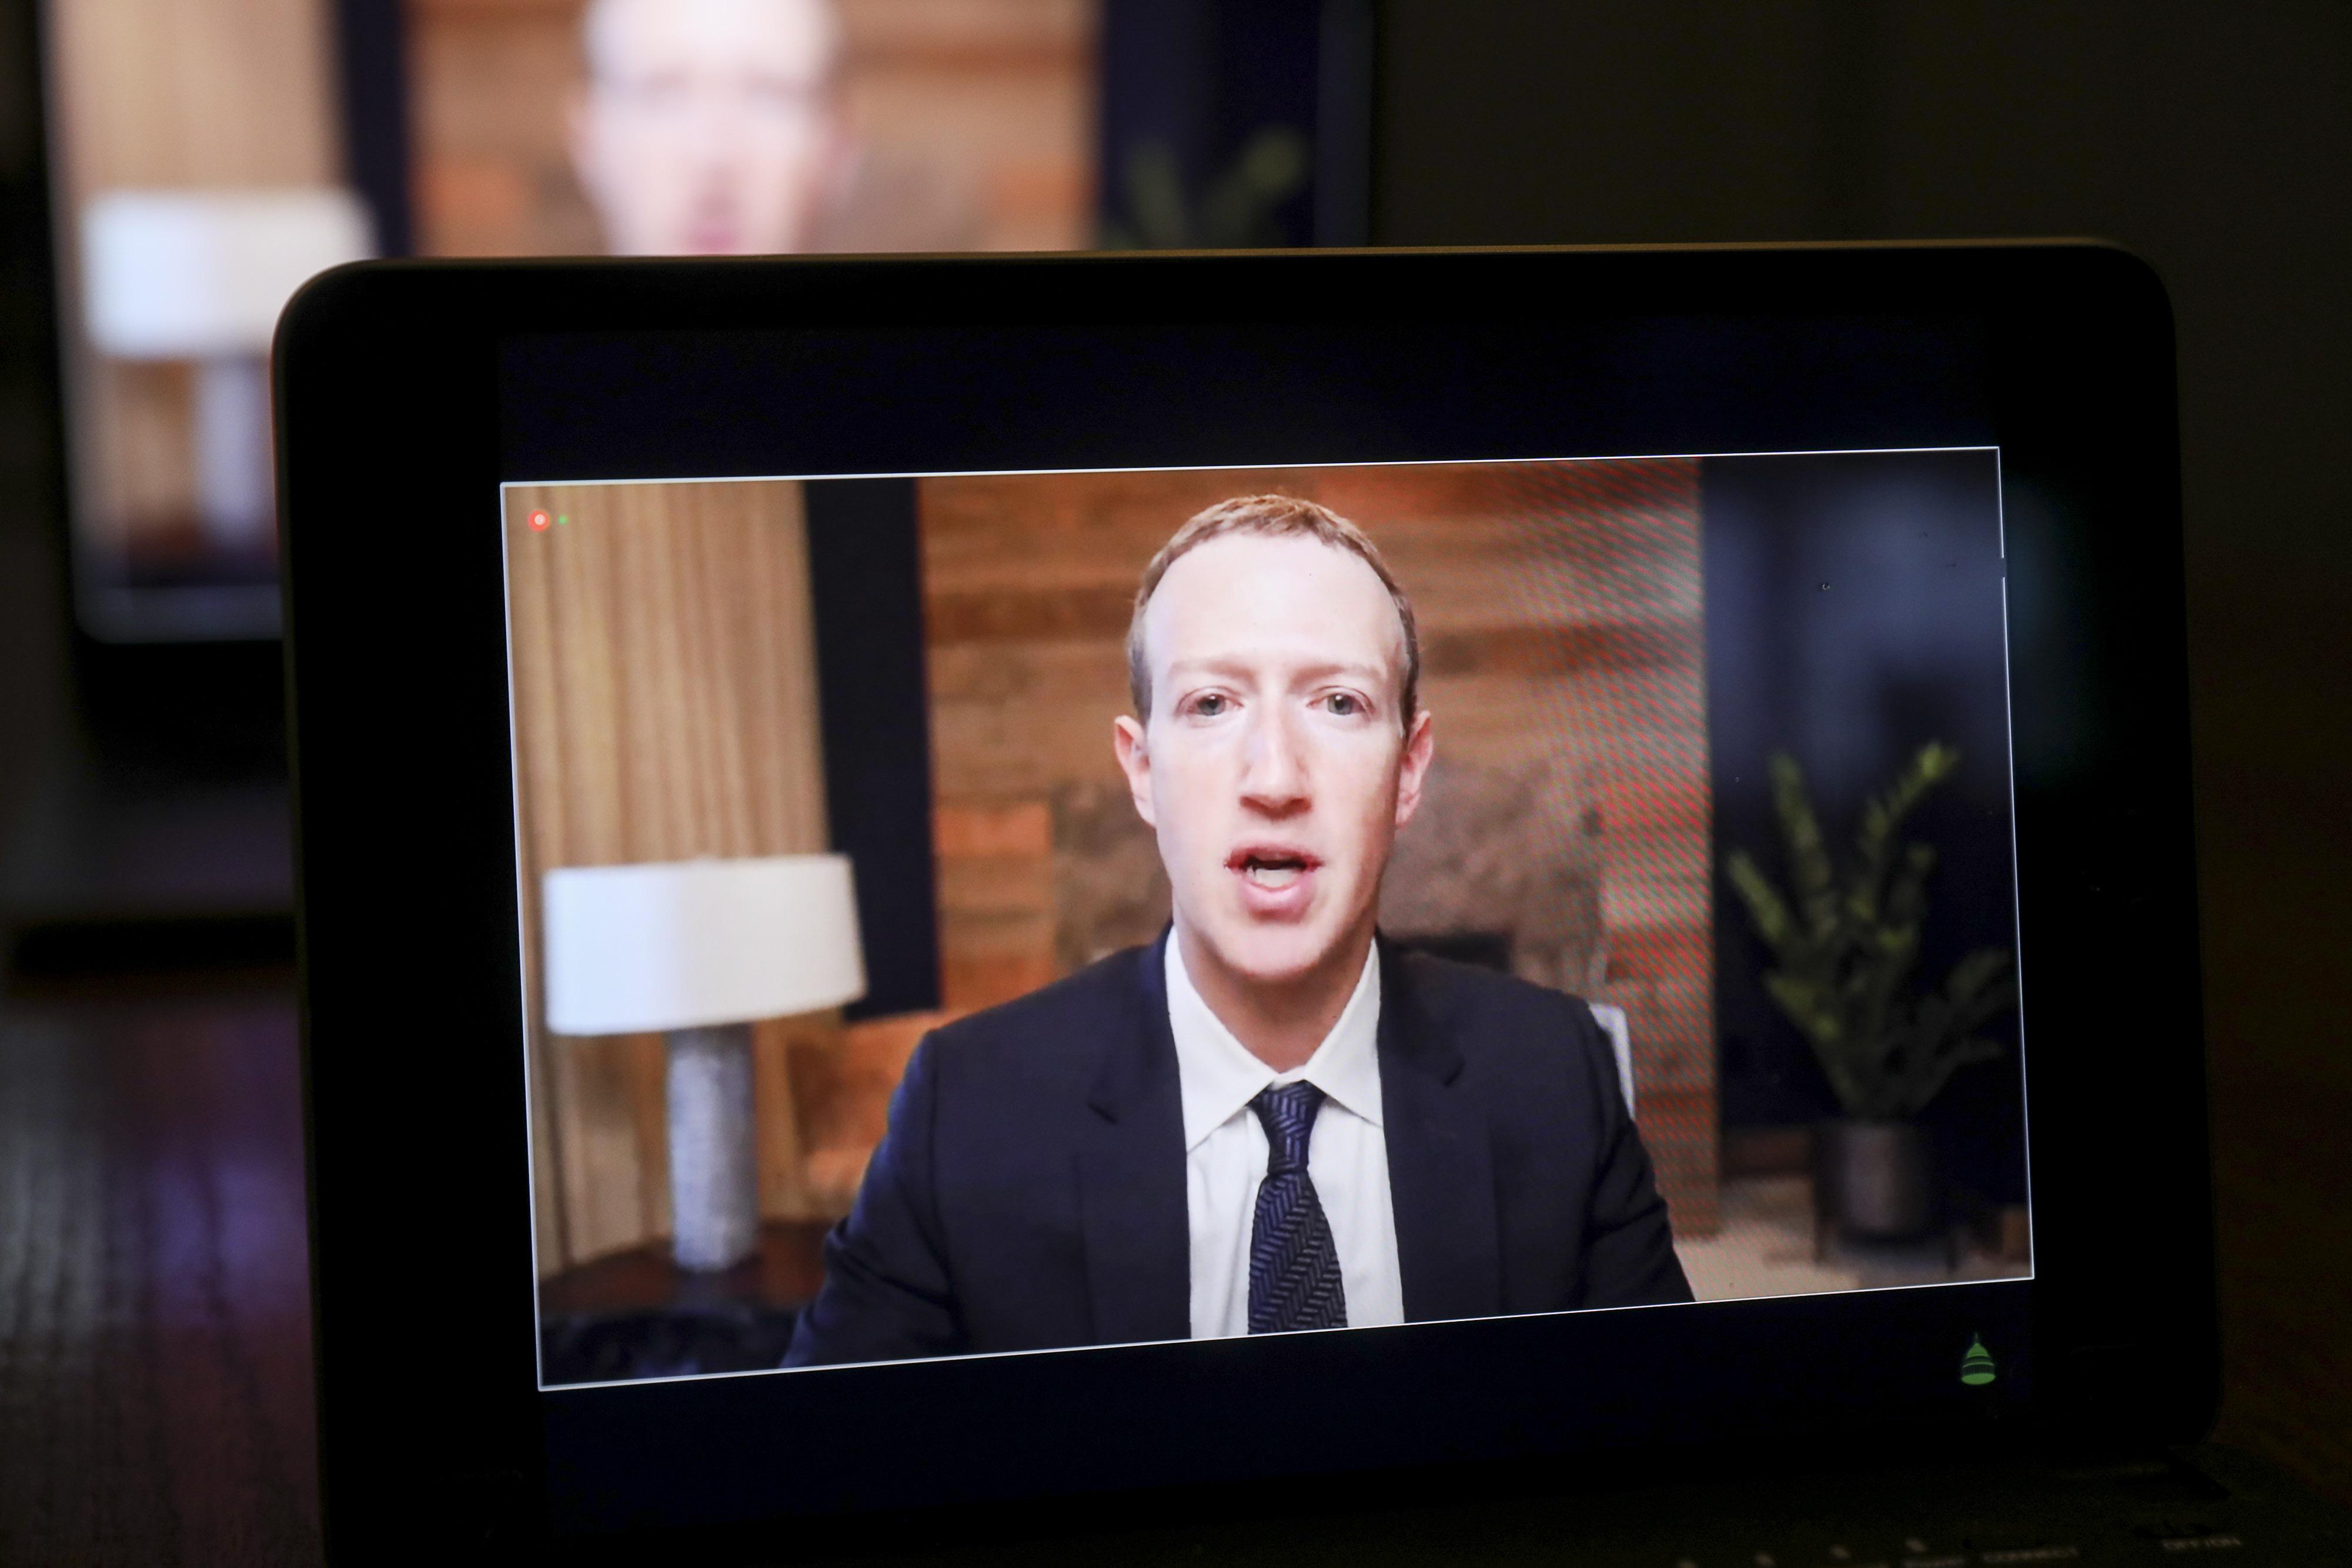 Mark Zuckerberg appearing on a laptop screen.